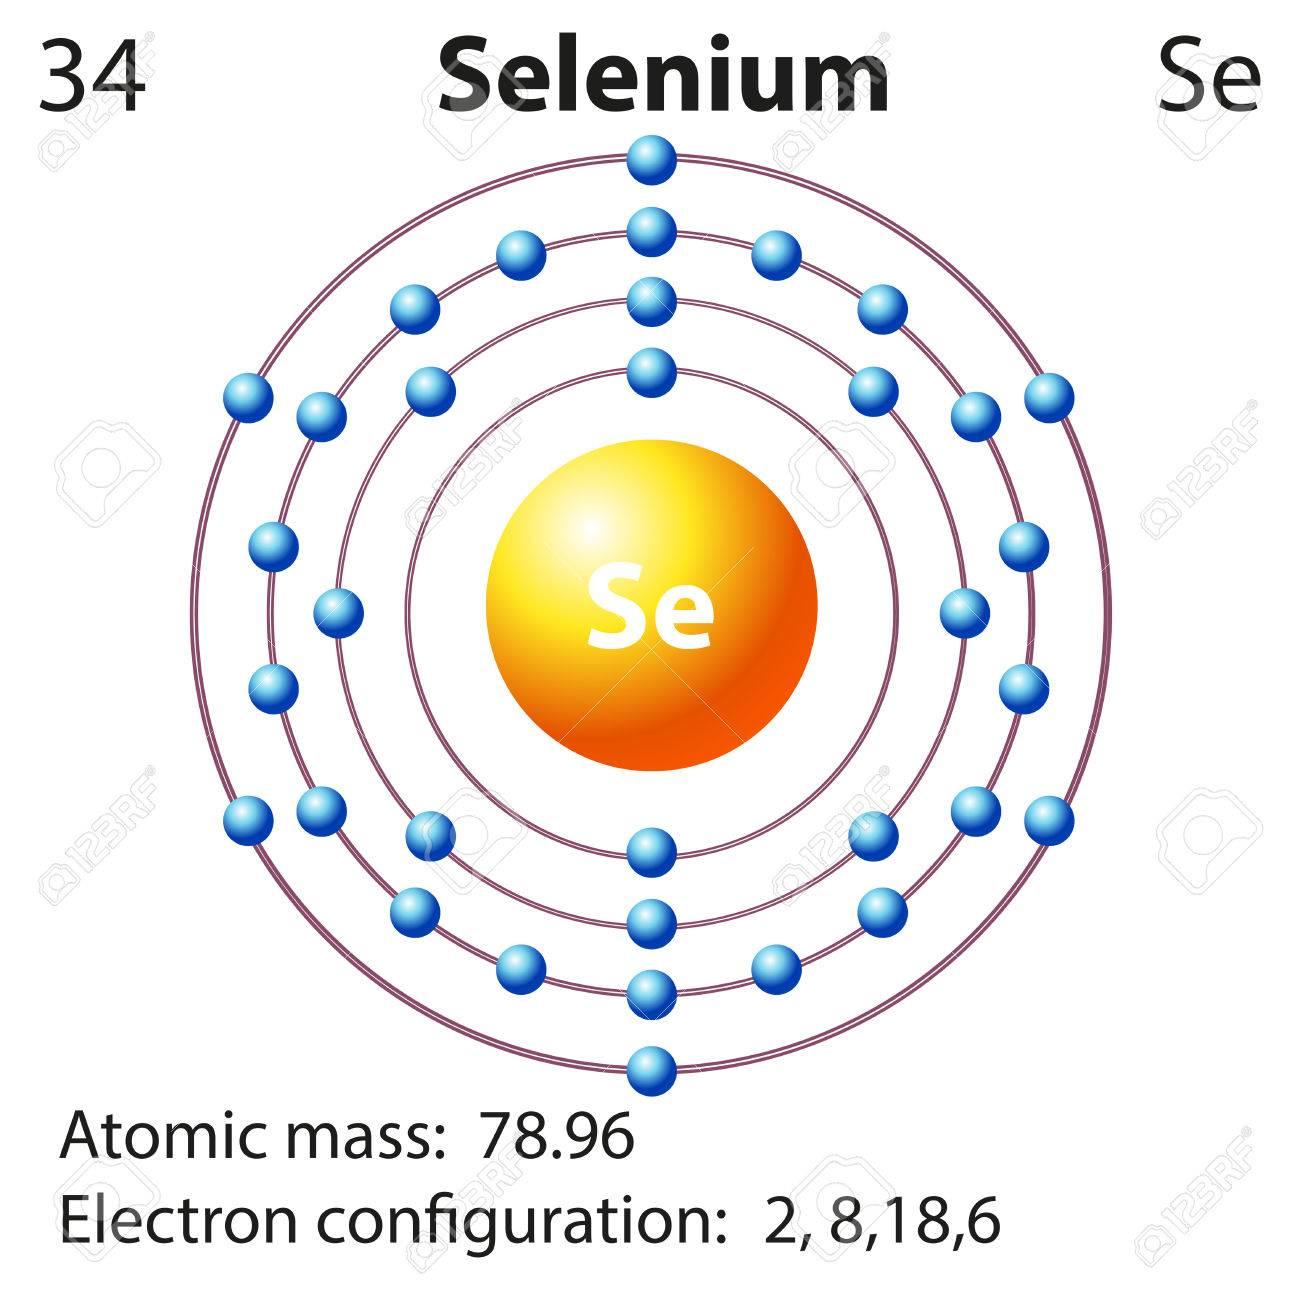 Symbol and electron diagram for selenium illustration royalty free symbol and electron diagram for selenium illustration stock vector 45866232 pooptronica